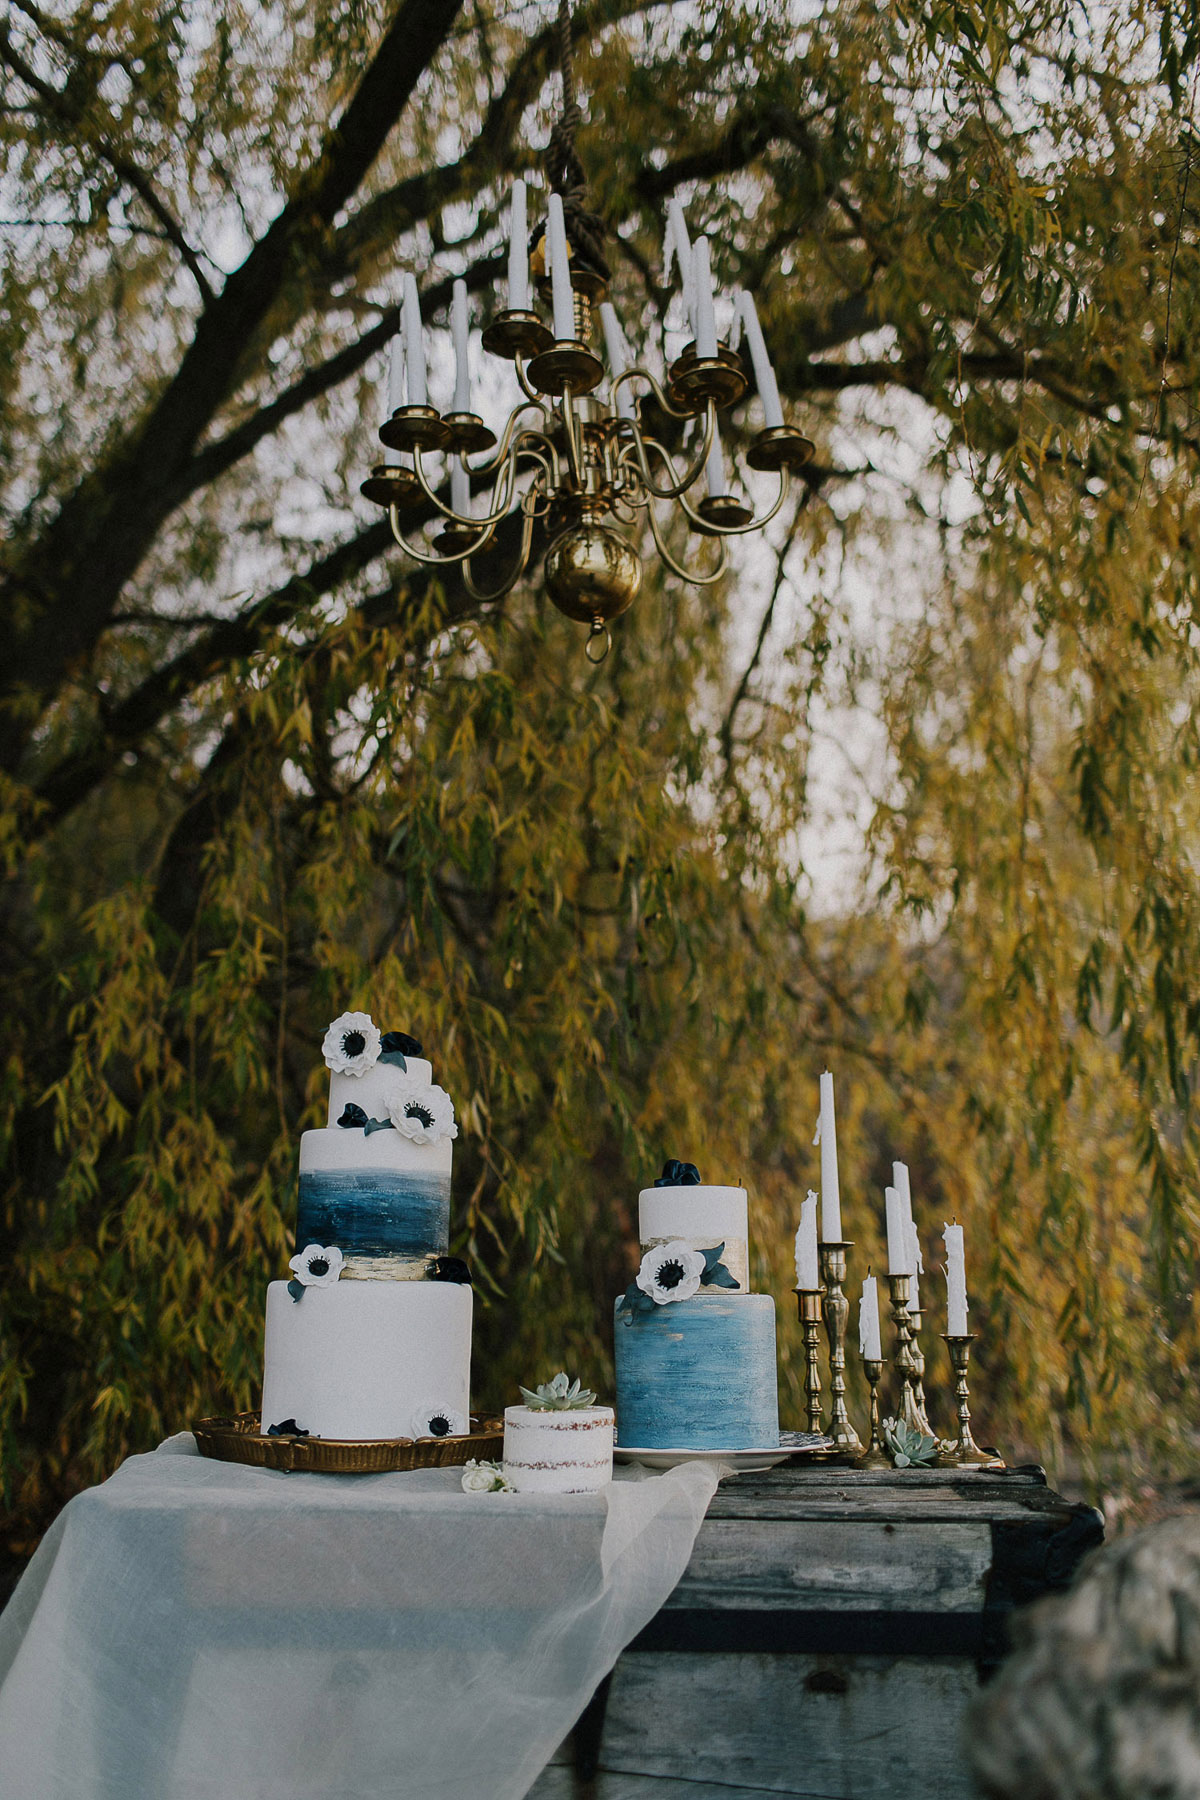 ballad-photography-vineyard-bride-swish-list-niagara-seaside-wedding-editorial-47.jpg